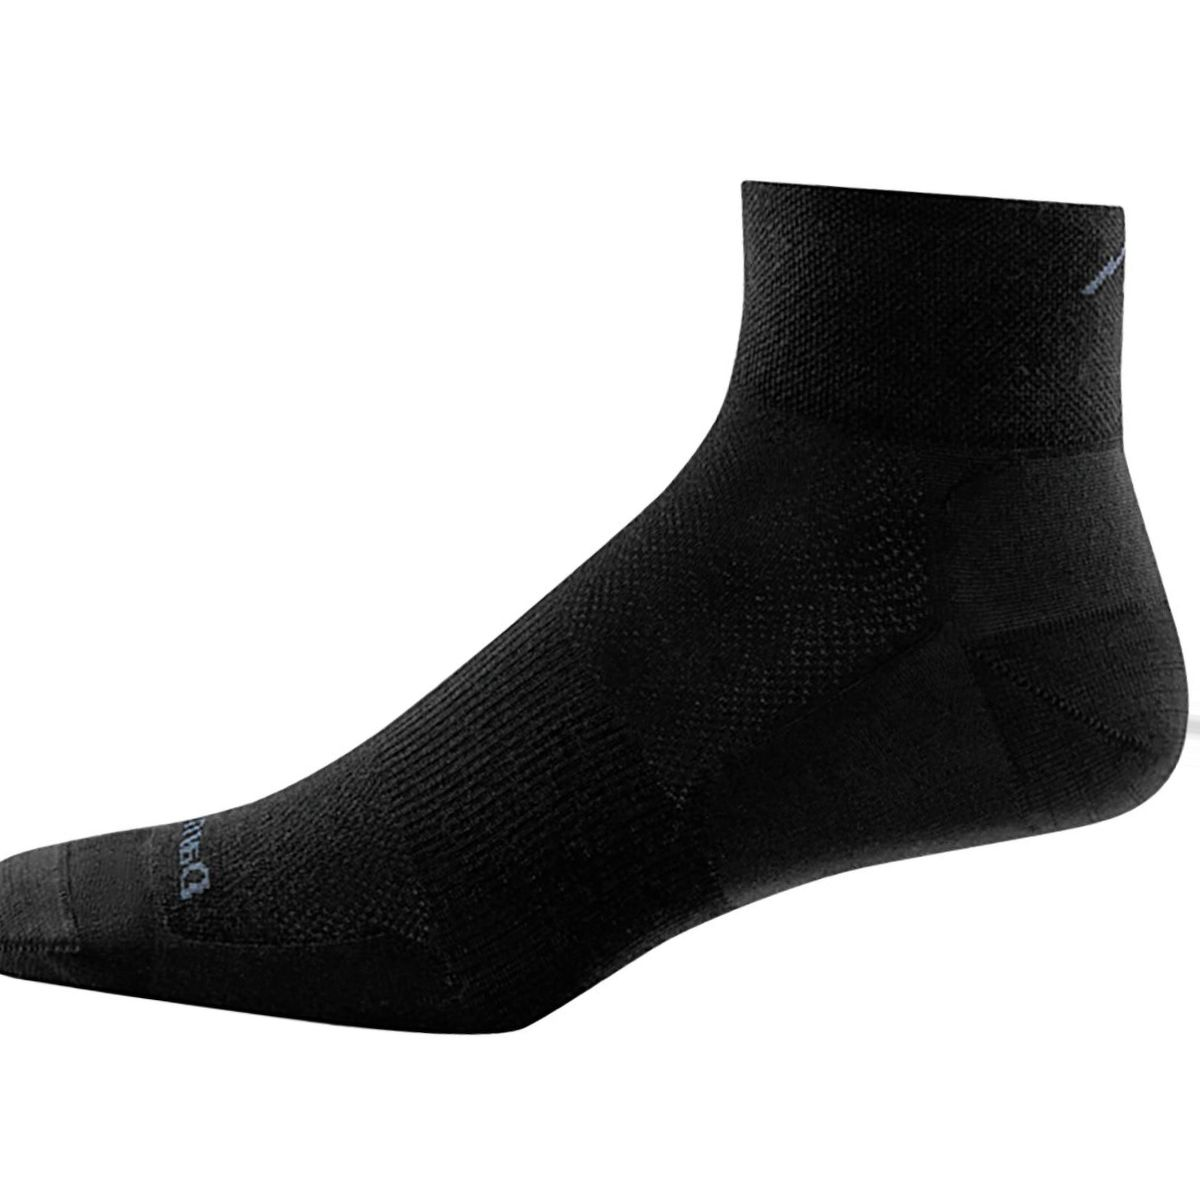 Darn Tough Pursuit 1/4 Ultra-Light Sock - Men's